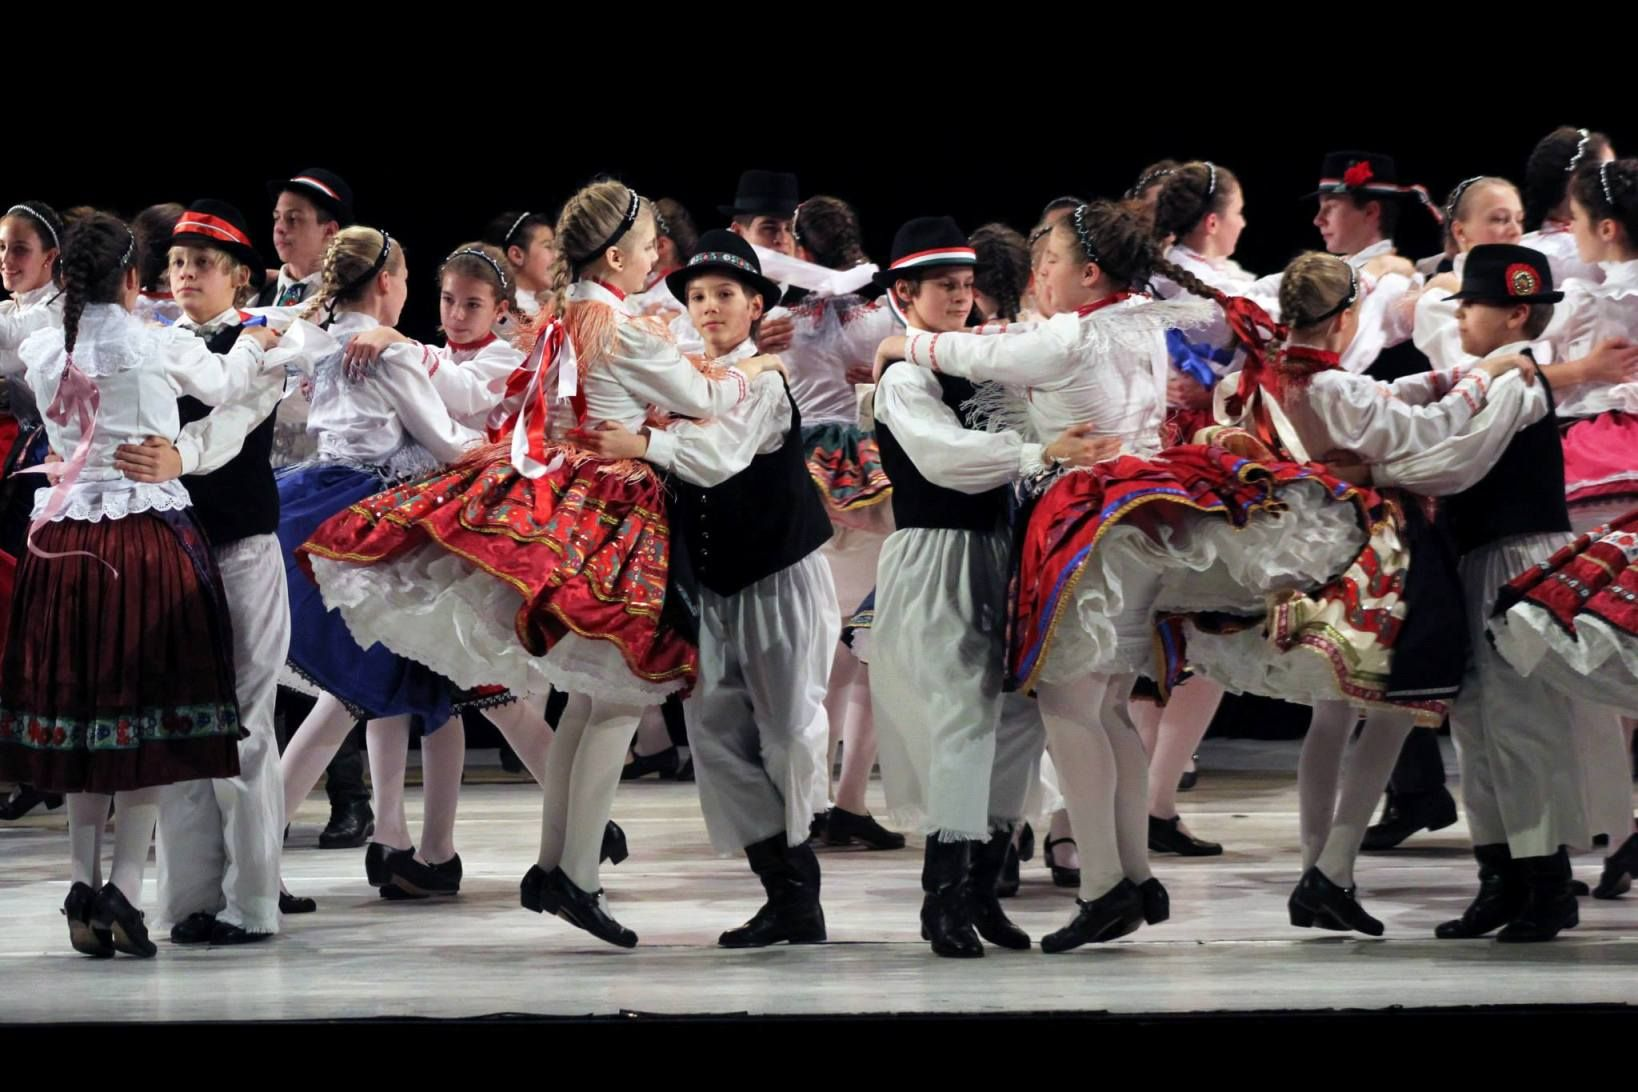 Fotó: kulonorak-budapesten.hu